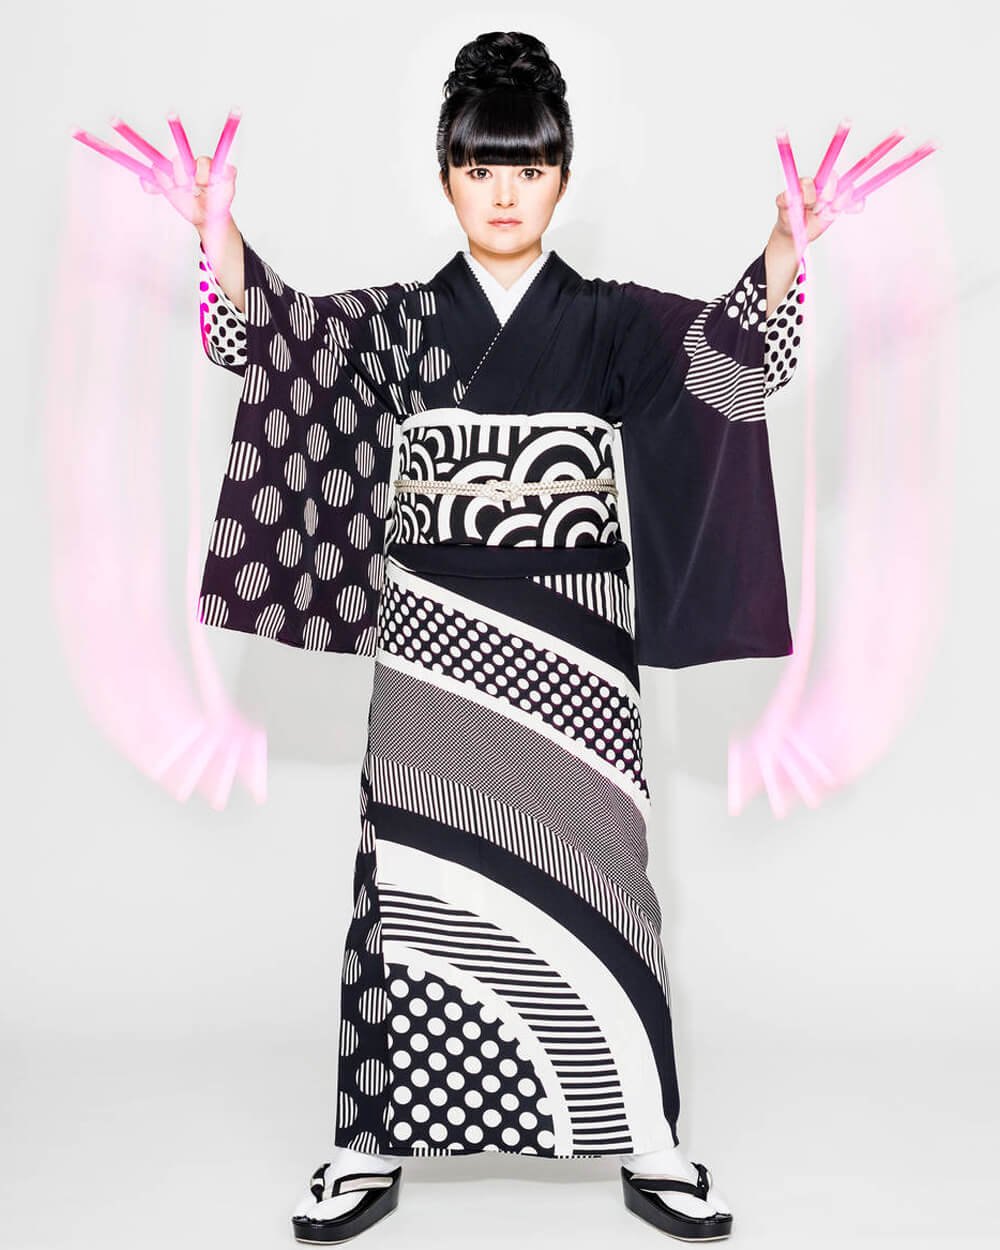 Hiroko Takahashi kimono featured in 'Kimono: Kyoto to Catwalk' at the Victoria and Albert Museum.